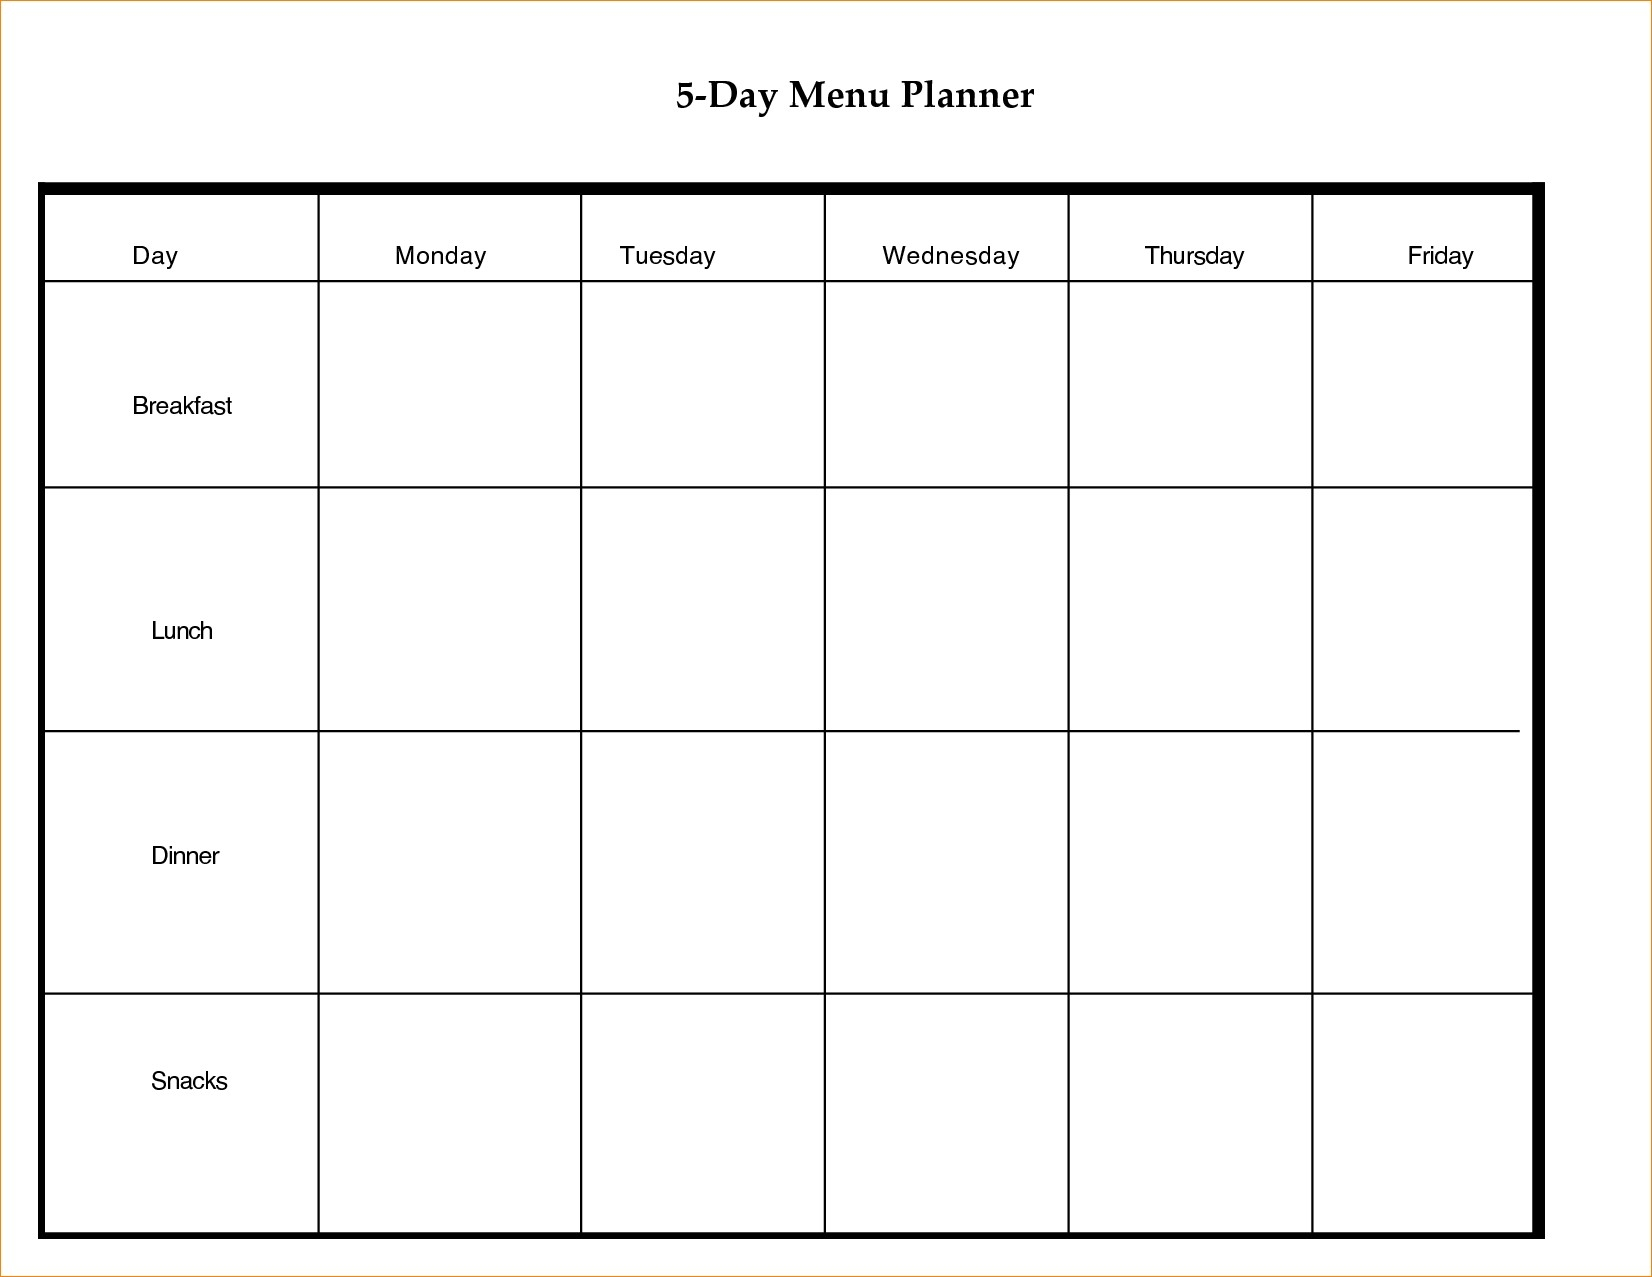 Printable 5 Day Calendar Blank Calendar Template 5 Day Week 0 8 With_5 Day Blank Calendar Free